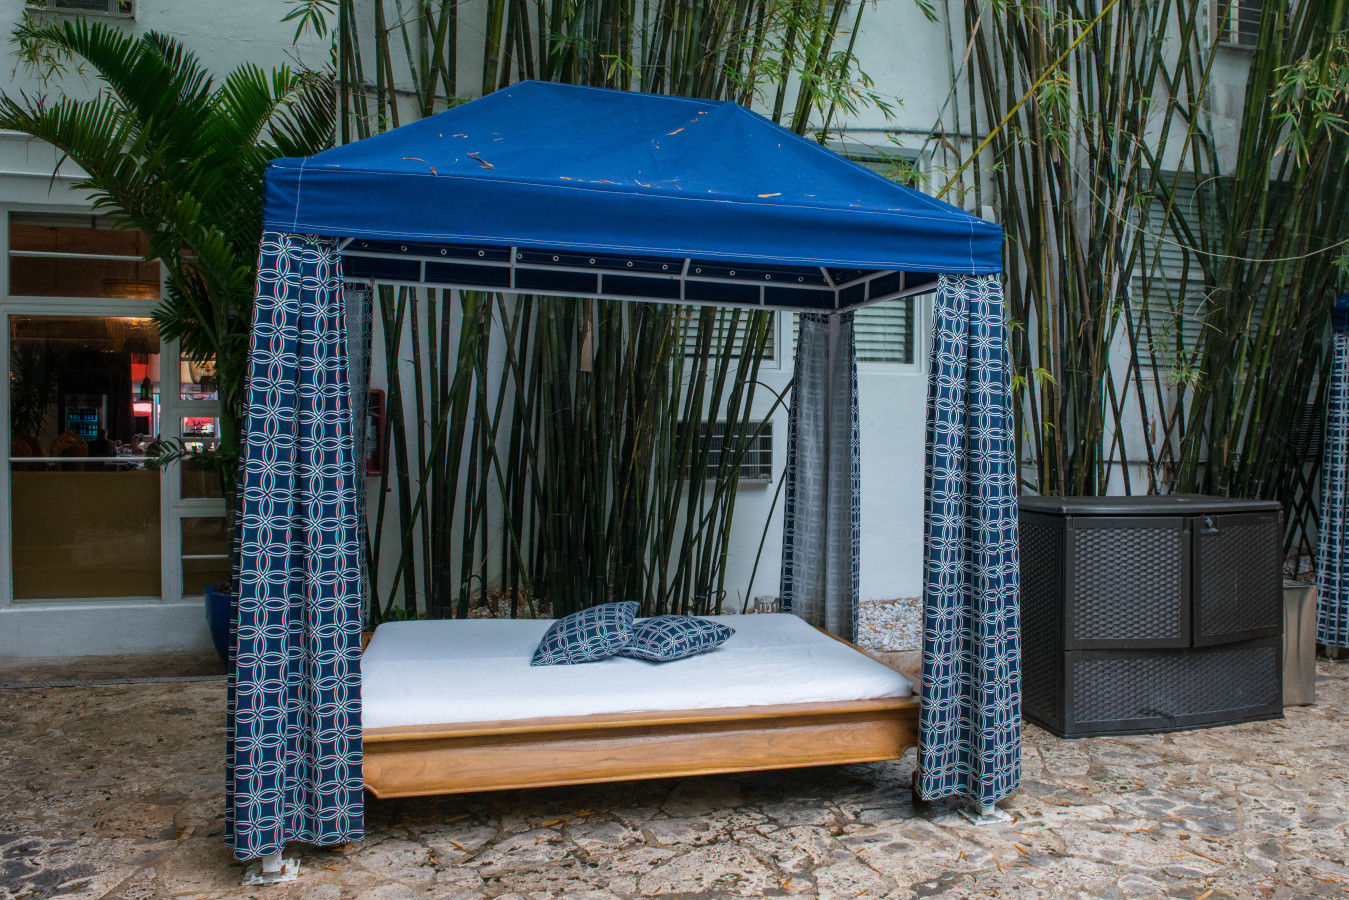 Bamboo Pool Cabana